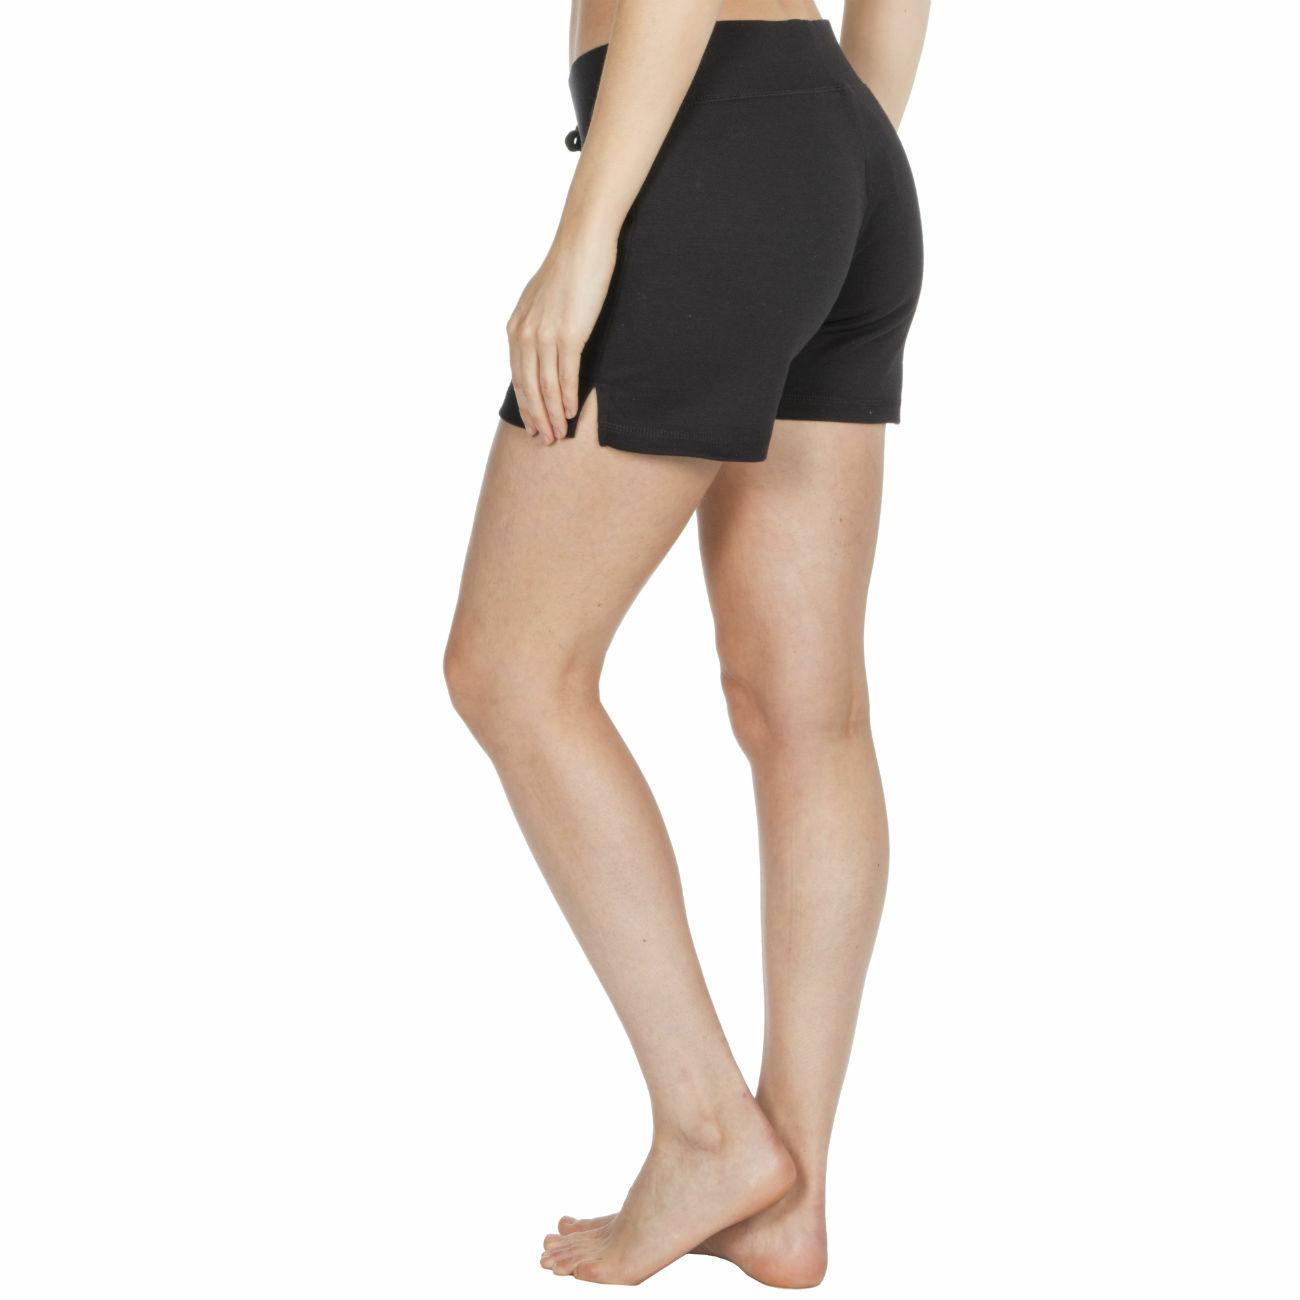 Womens-Cotton-Jersey-Shorts-Elastic-Waist-Summer-Beach-Casual-Yoga-Hot-Pants-New thumbnail 5